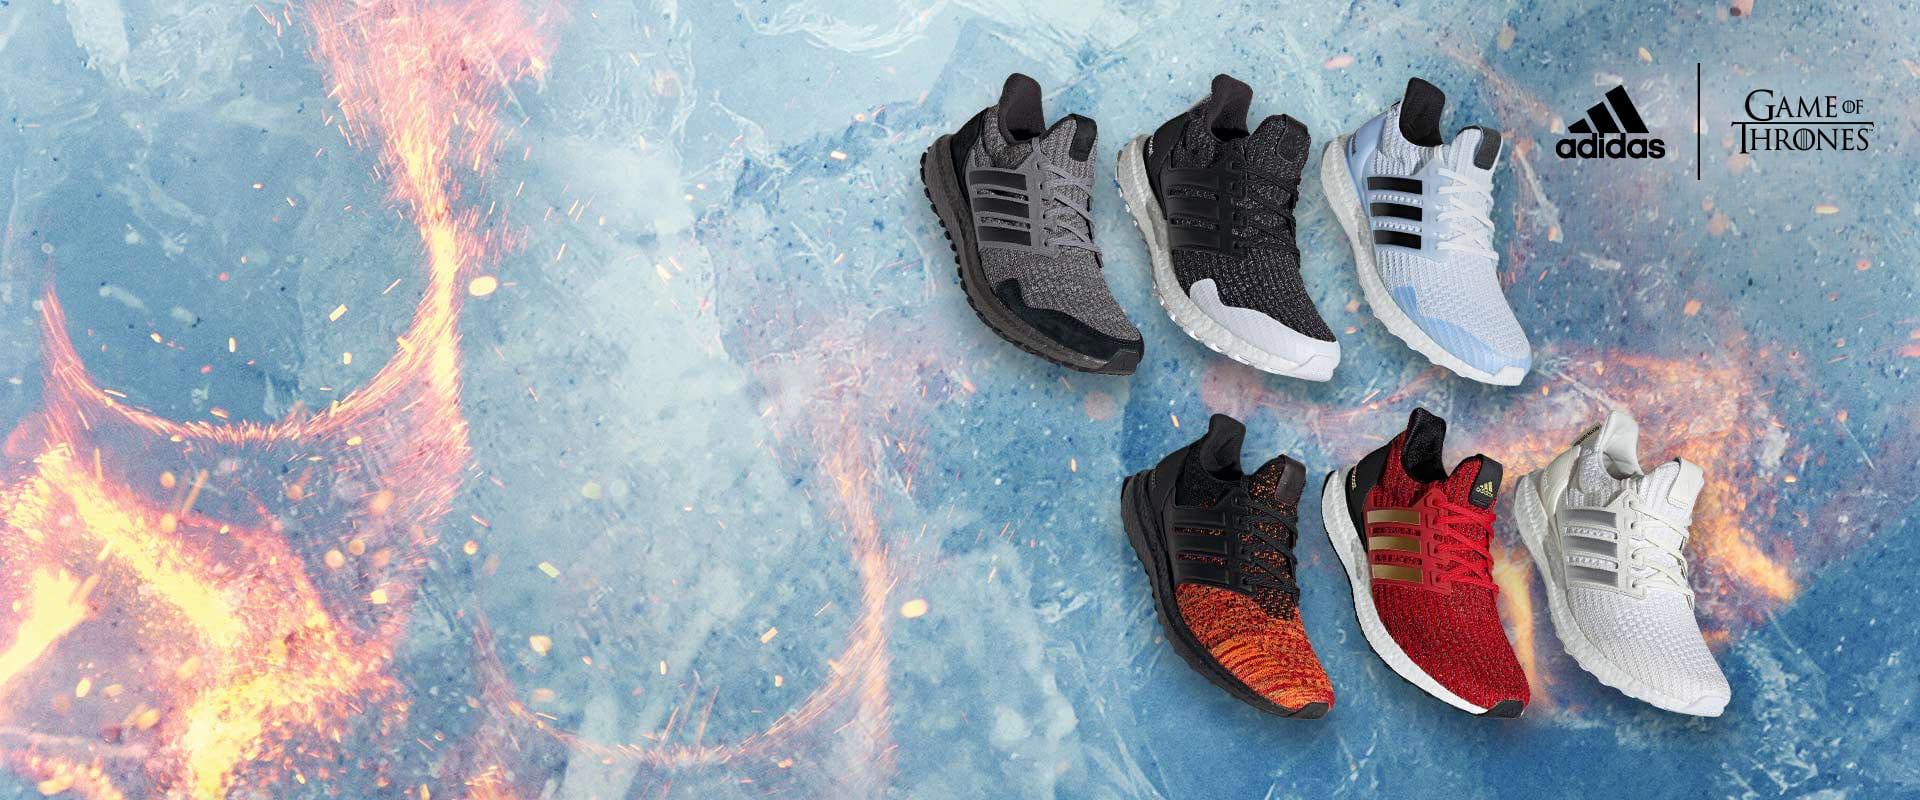 Adidas Site Officiel France